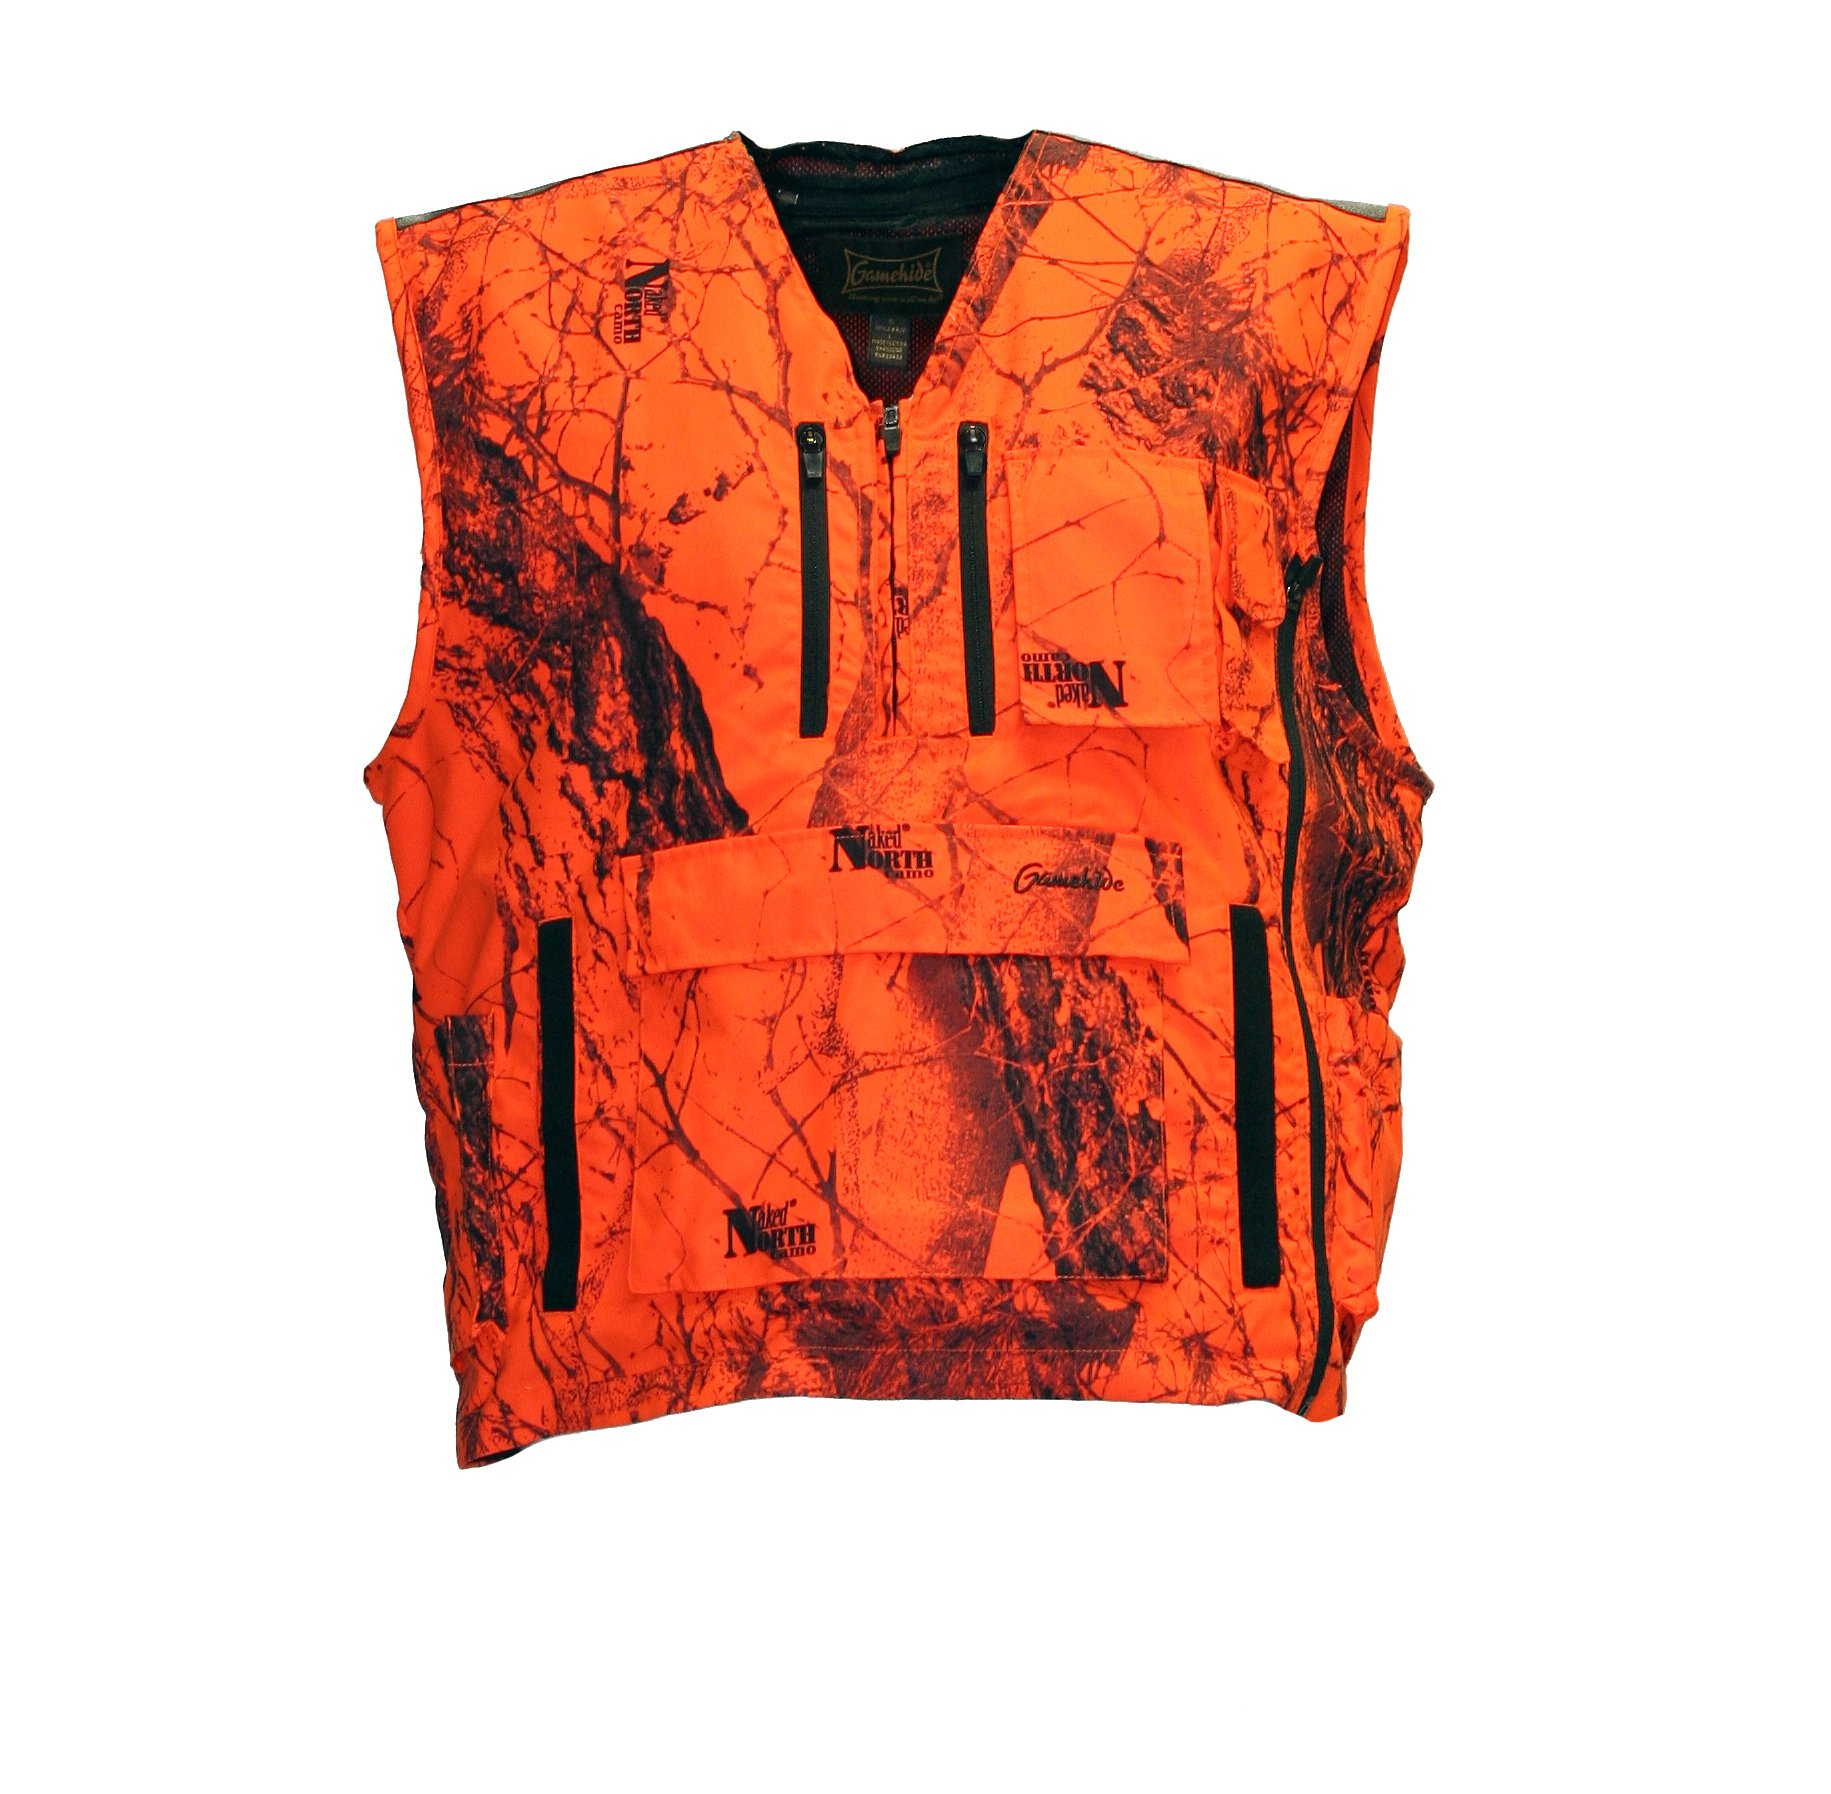 Mountain Pass Extreme Big Game Blaze Vest (Orange Camo, X-Large) by Gamehide